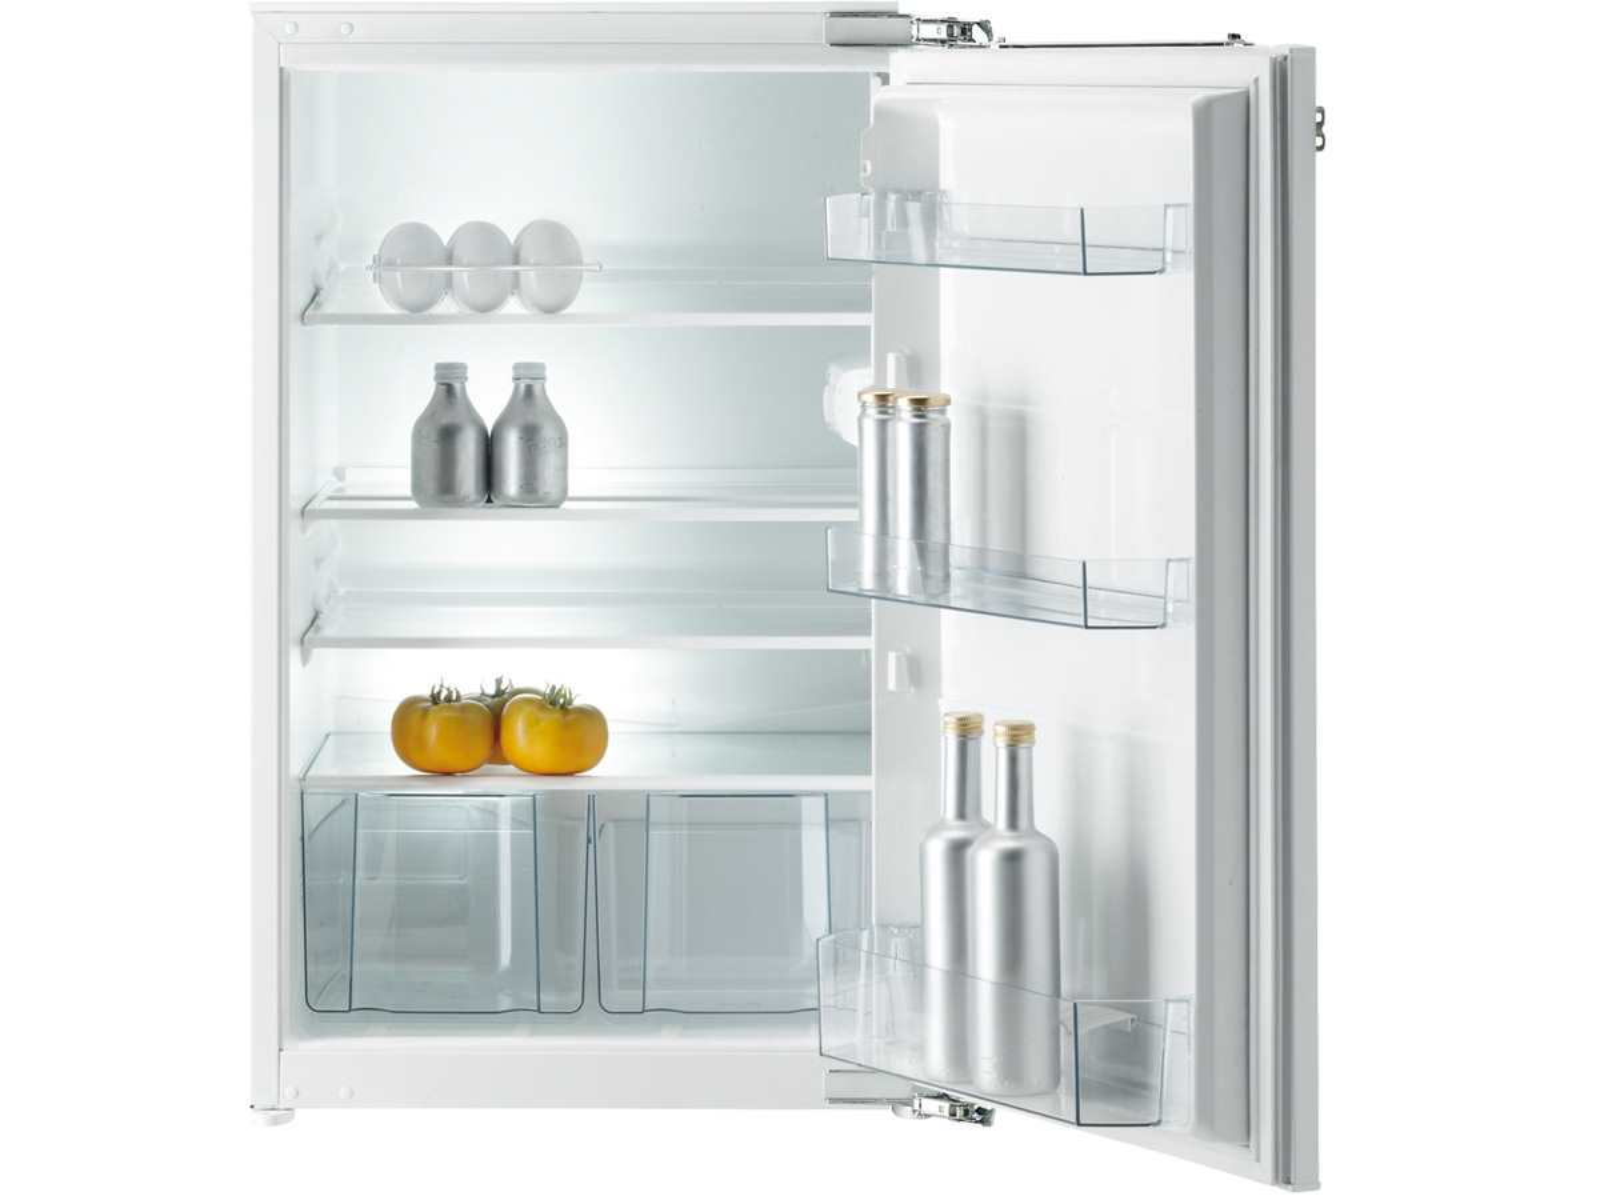 Aeg Kühlschrank Unterbau Integrierbar : Gorenje ri 5092 aw einbaukühlschrank moebelplus